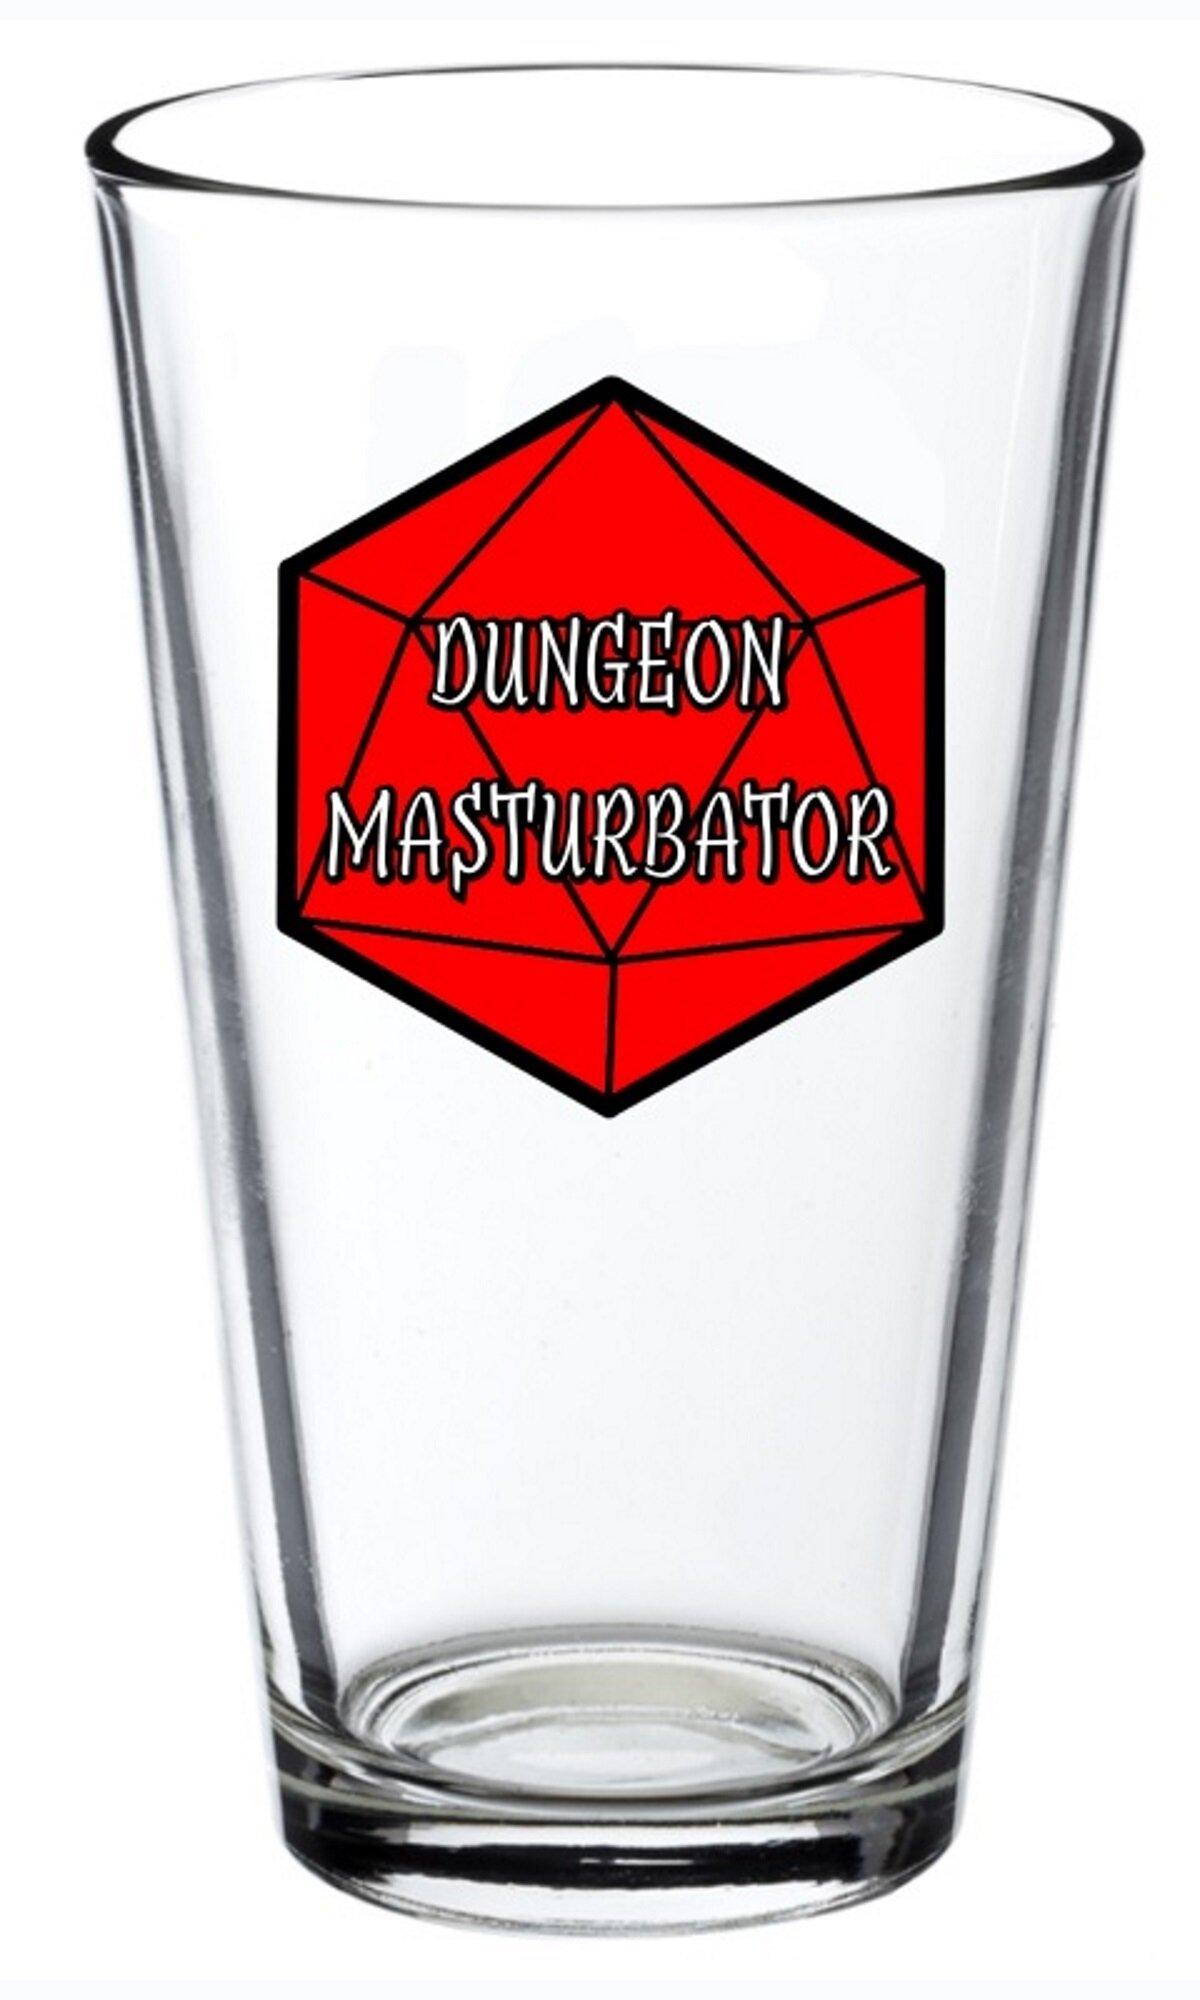 Dungeon Masturbator